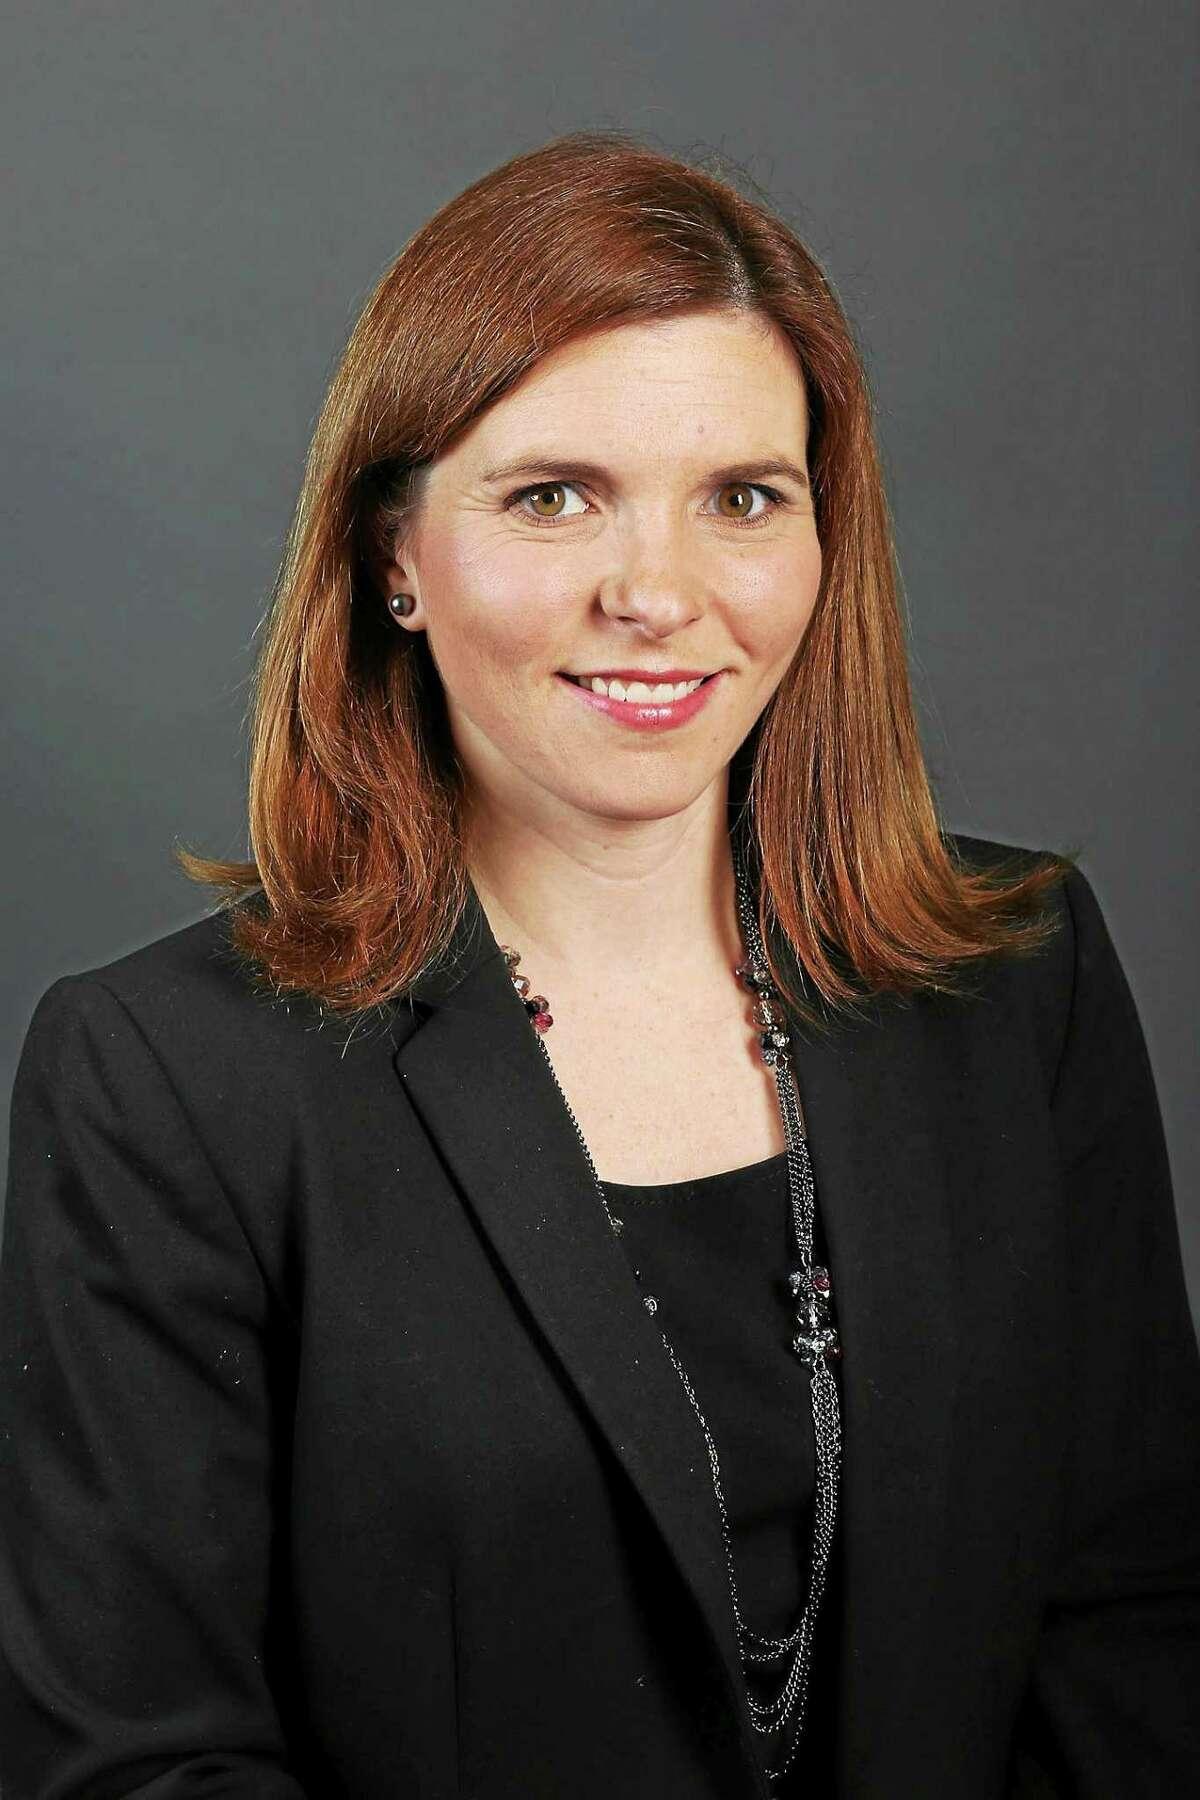 Alyssa Goduti of Cromwell recently completed Hartford's community-based leadership development program.